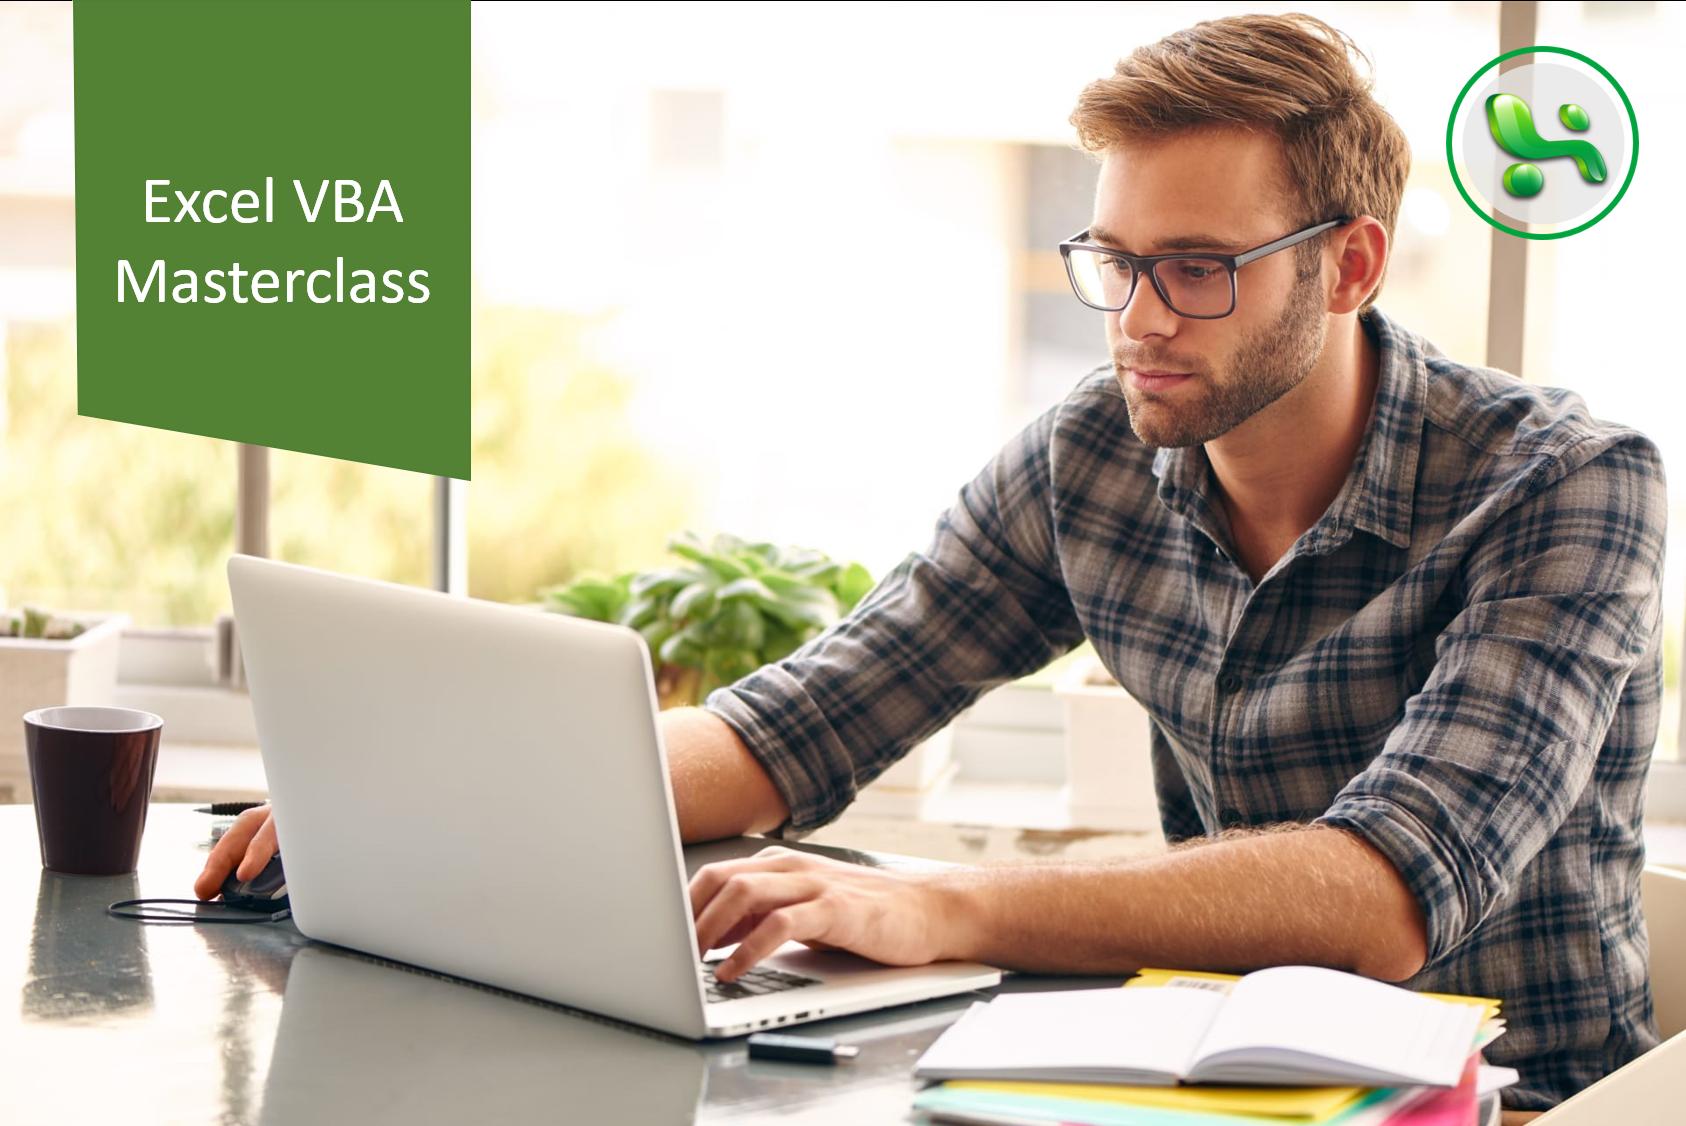 Excel VBA Masterclass 2